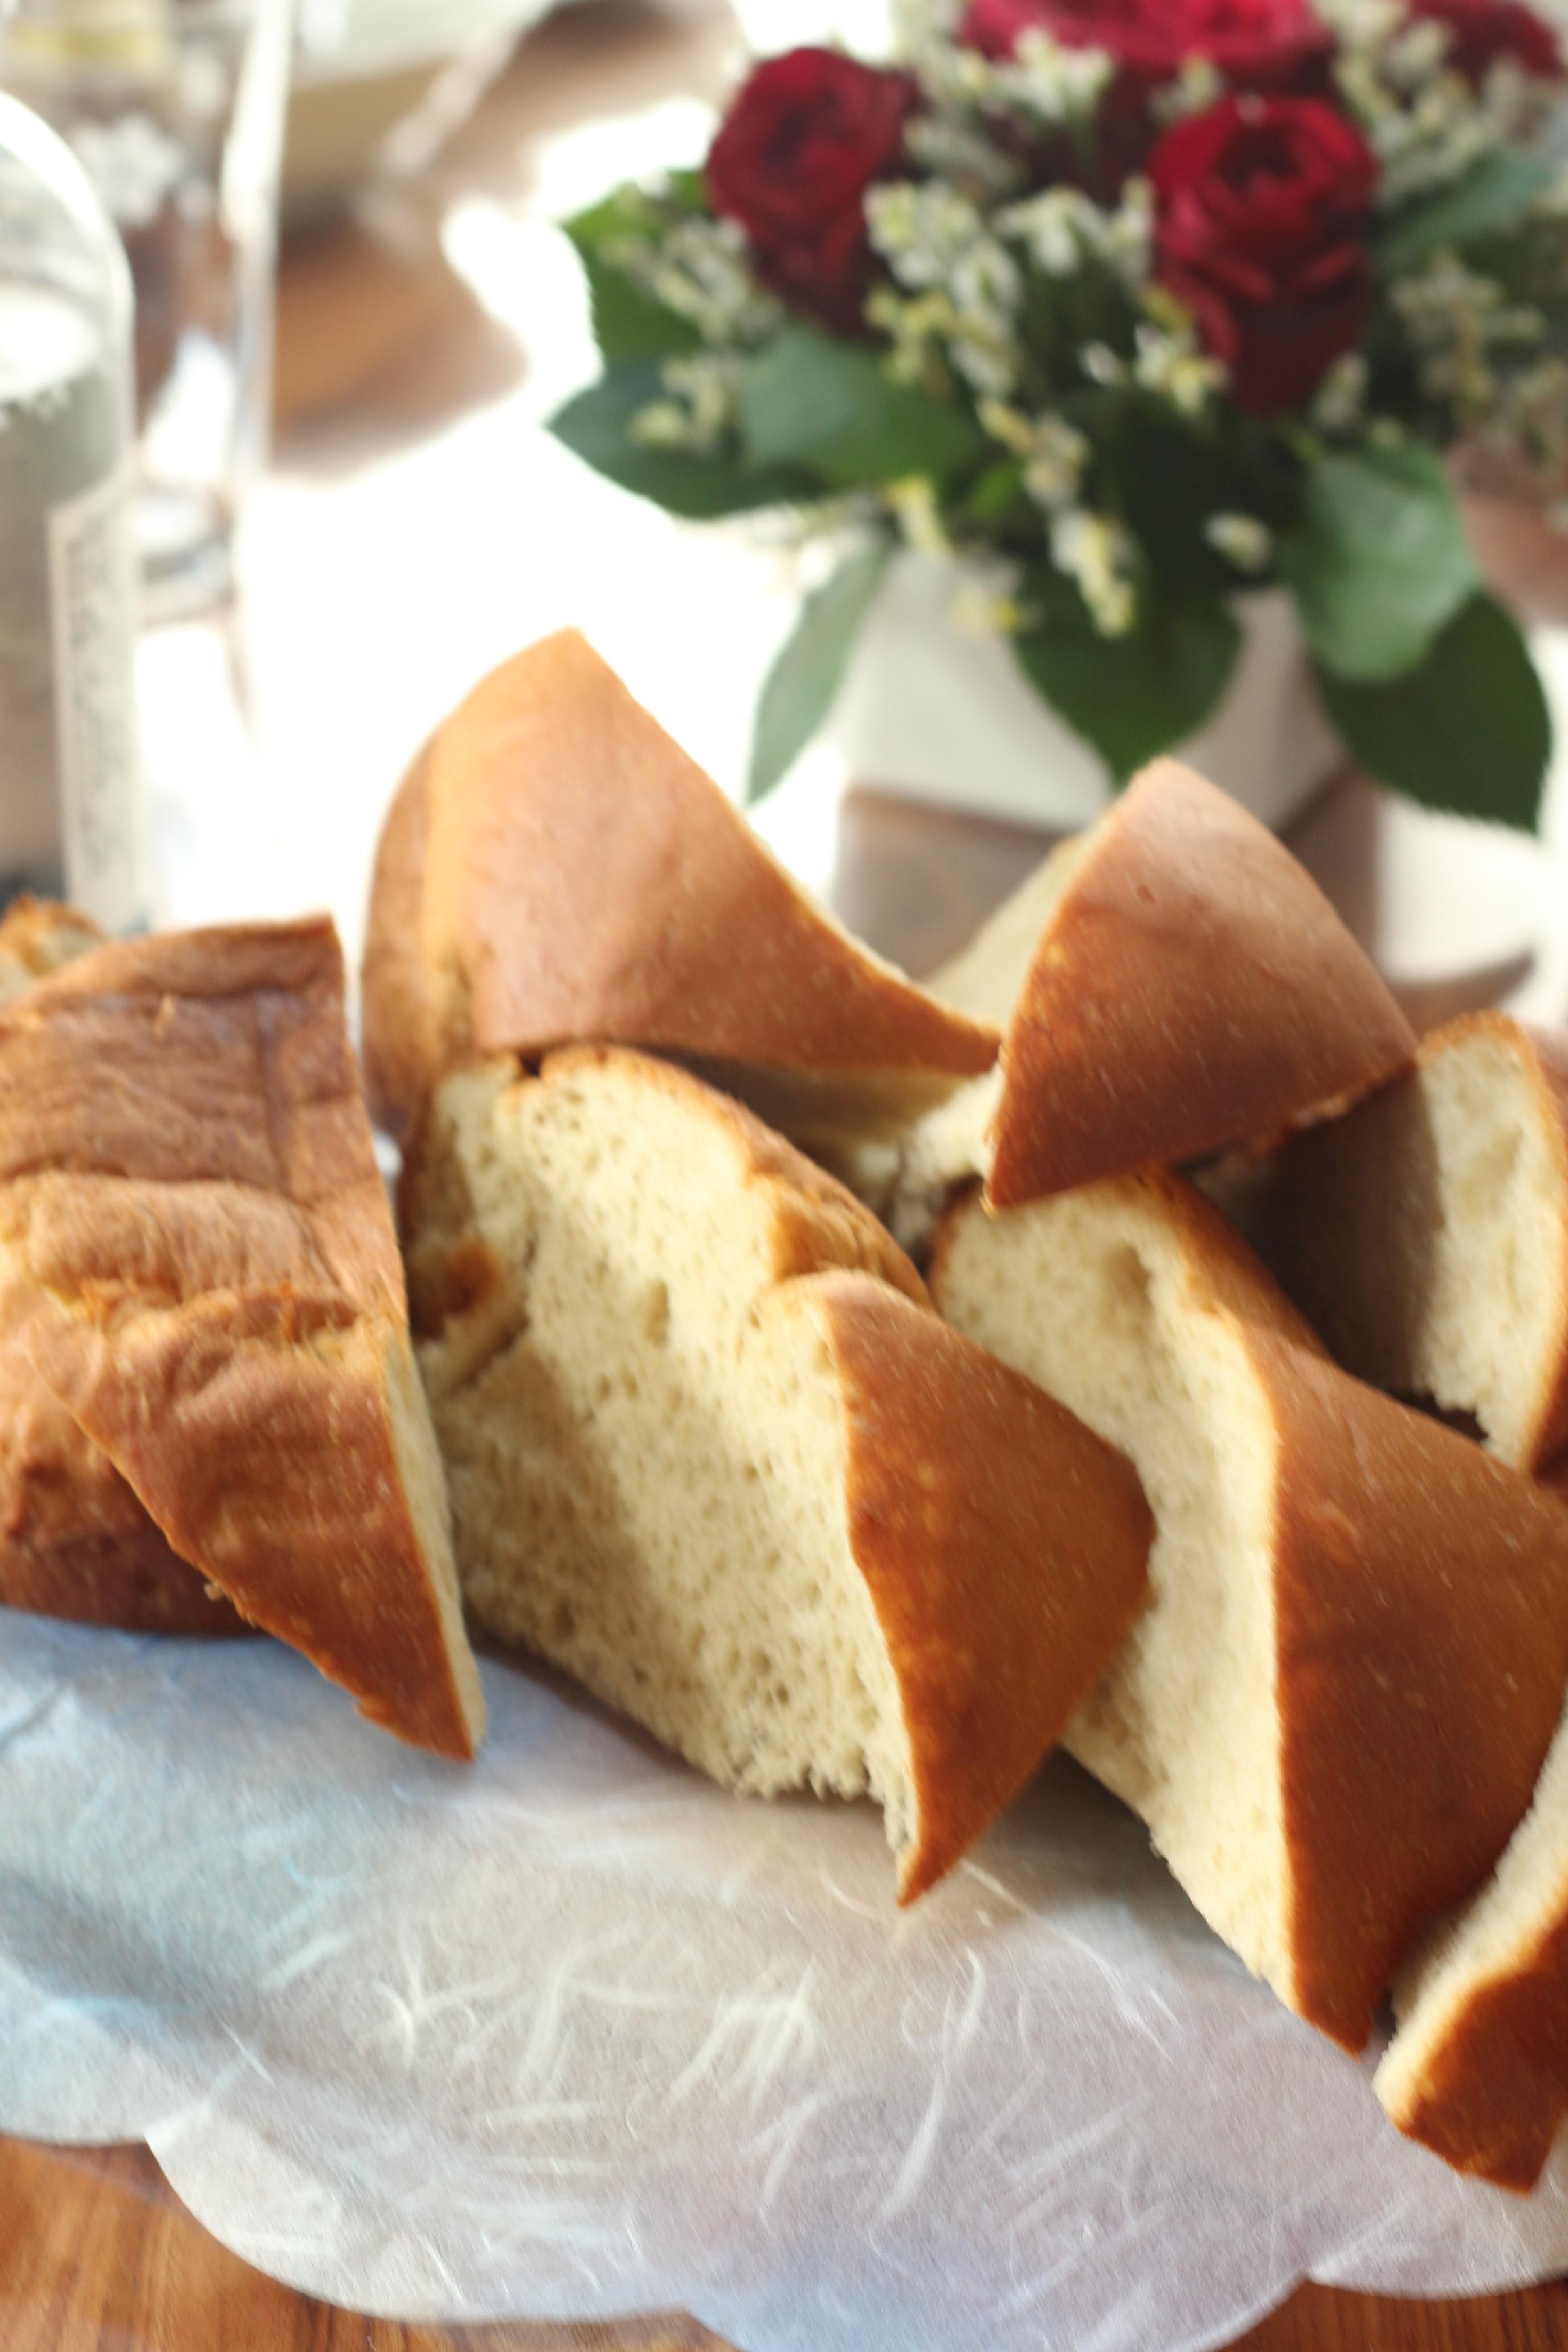 a-ta-sante糖質制限パン料理教室。山陰出張2日間。出雲大社、低糖質料理教室。